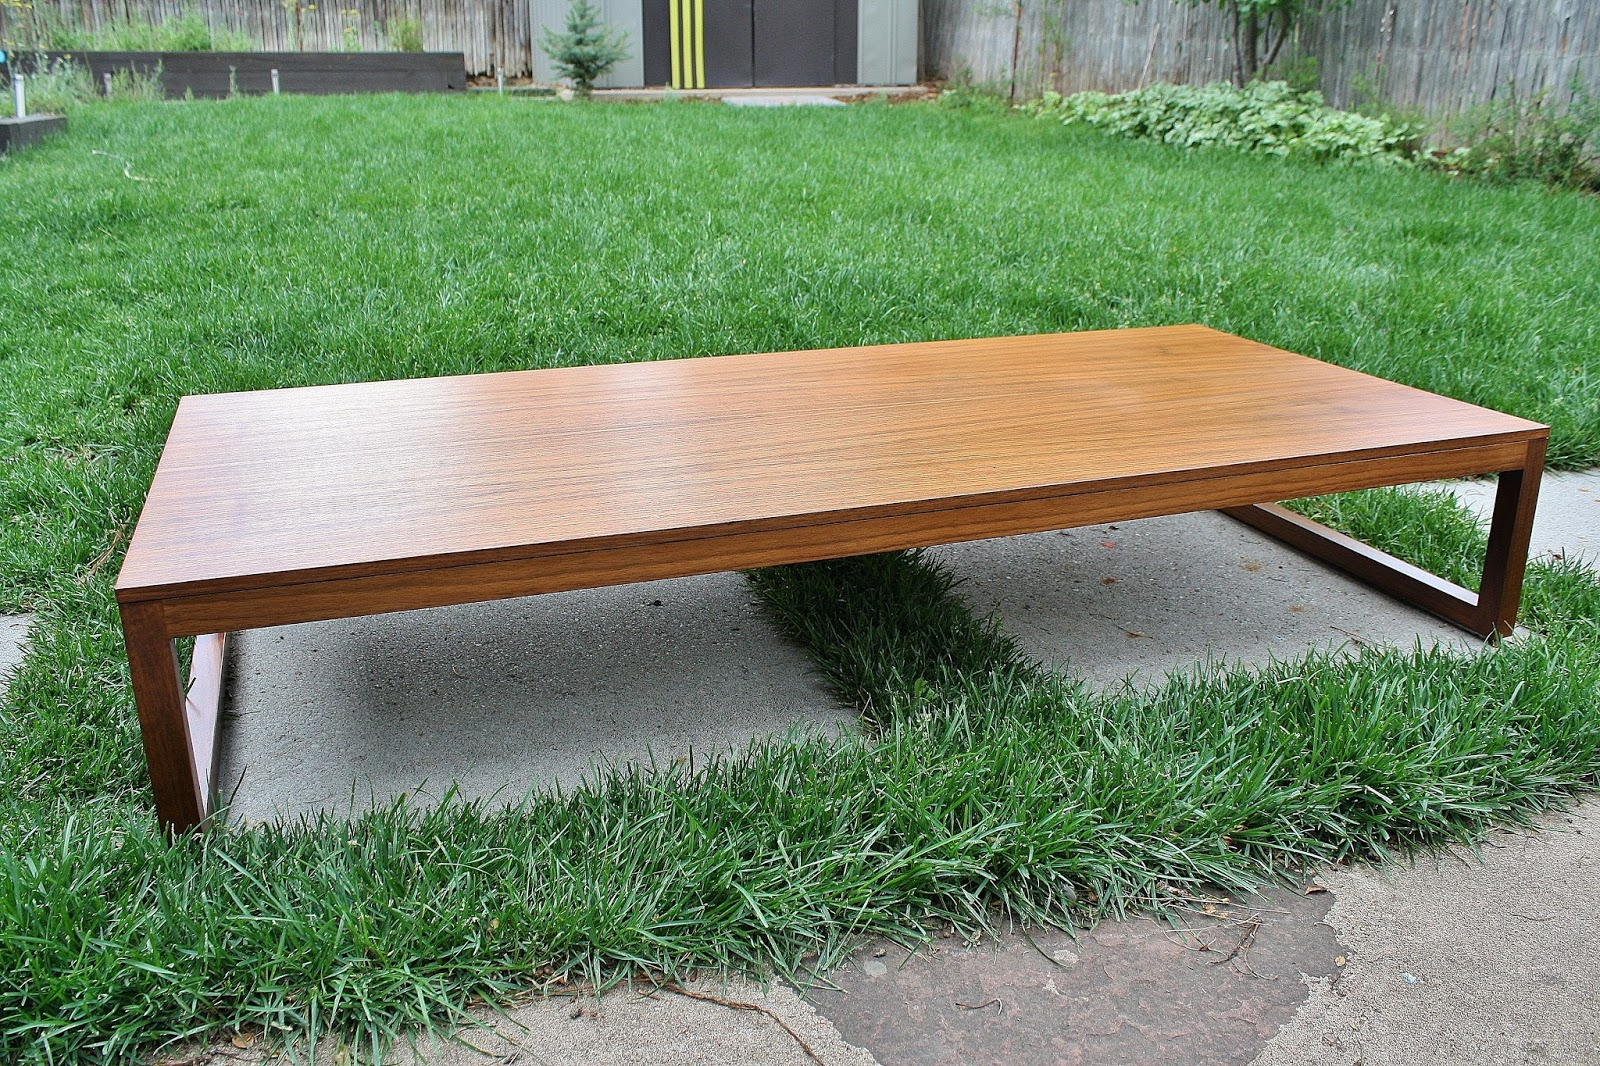 Modwerks: Low Minimalist Walnut Coffee Table from DWR